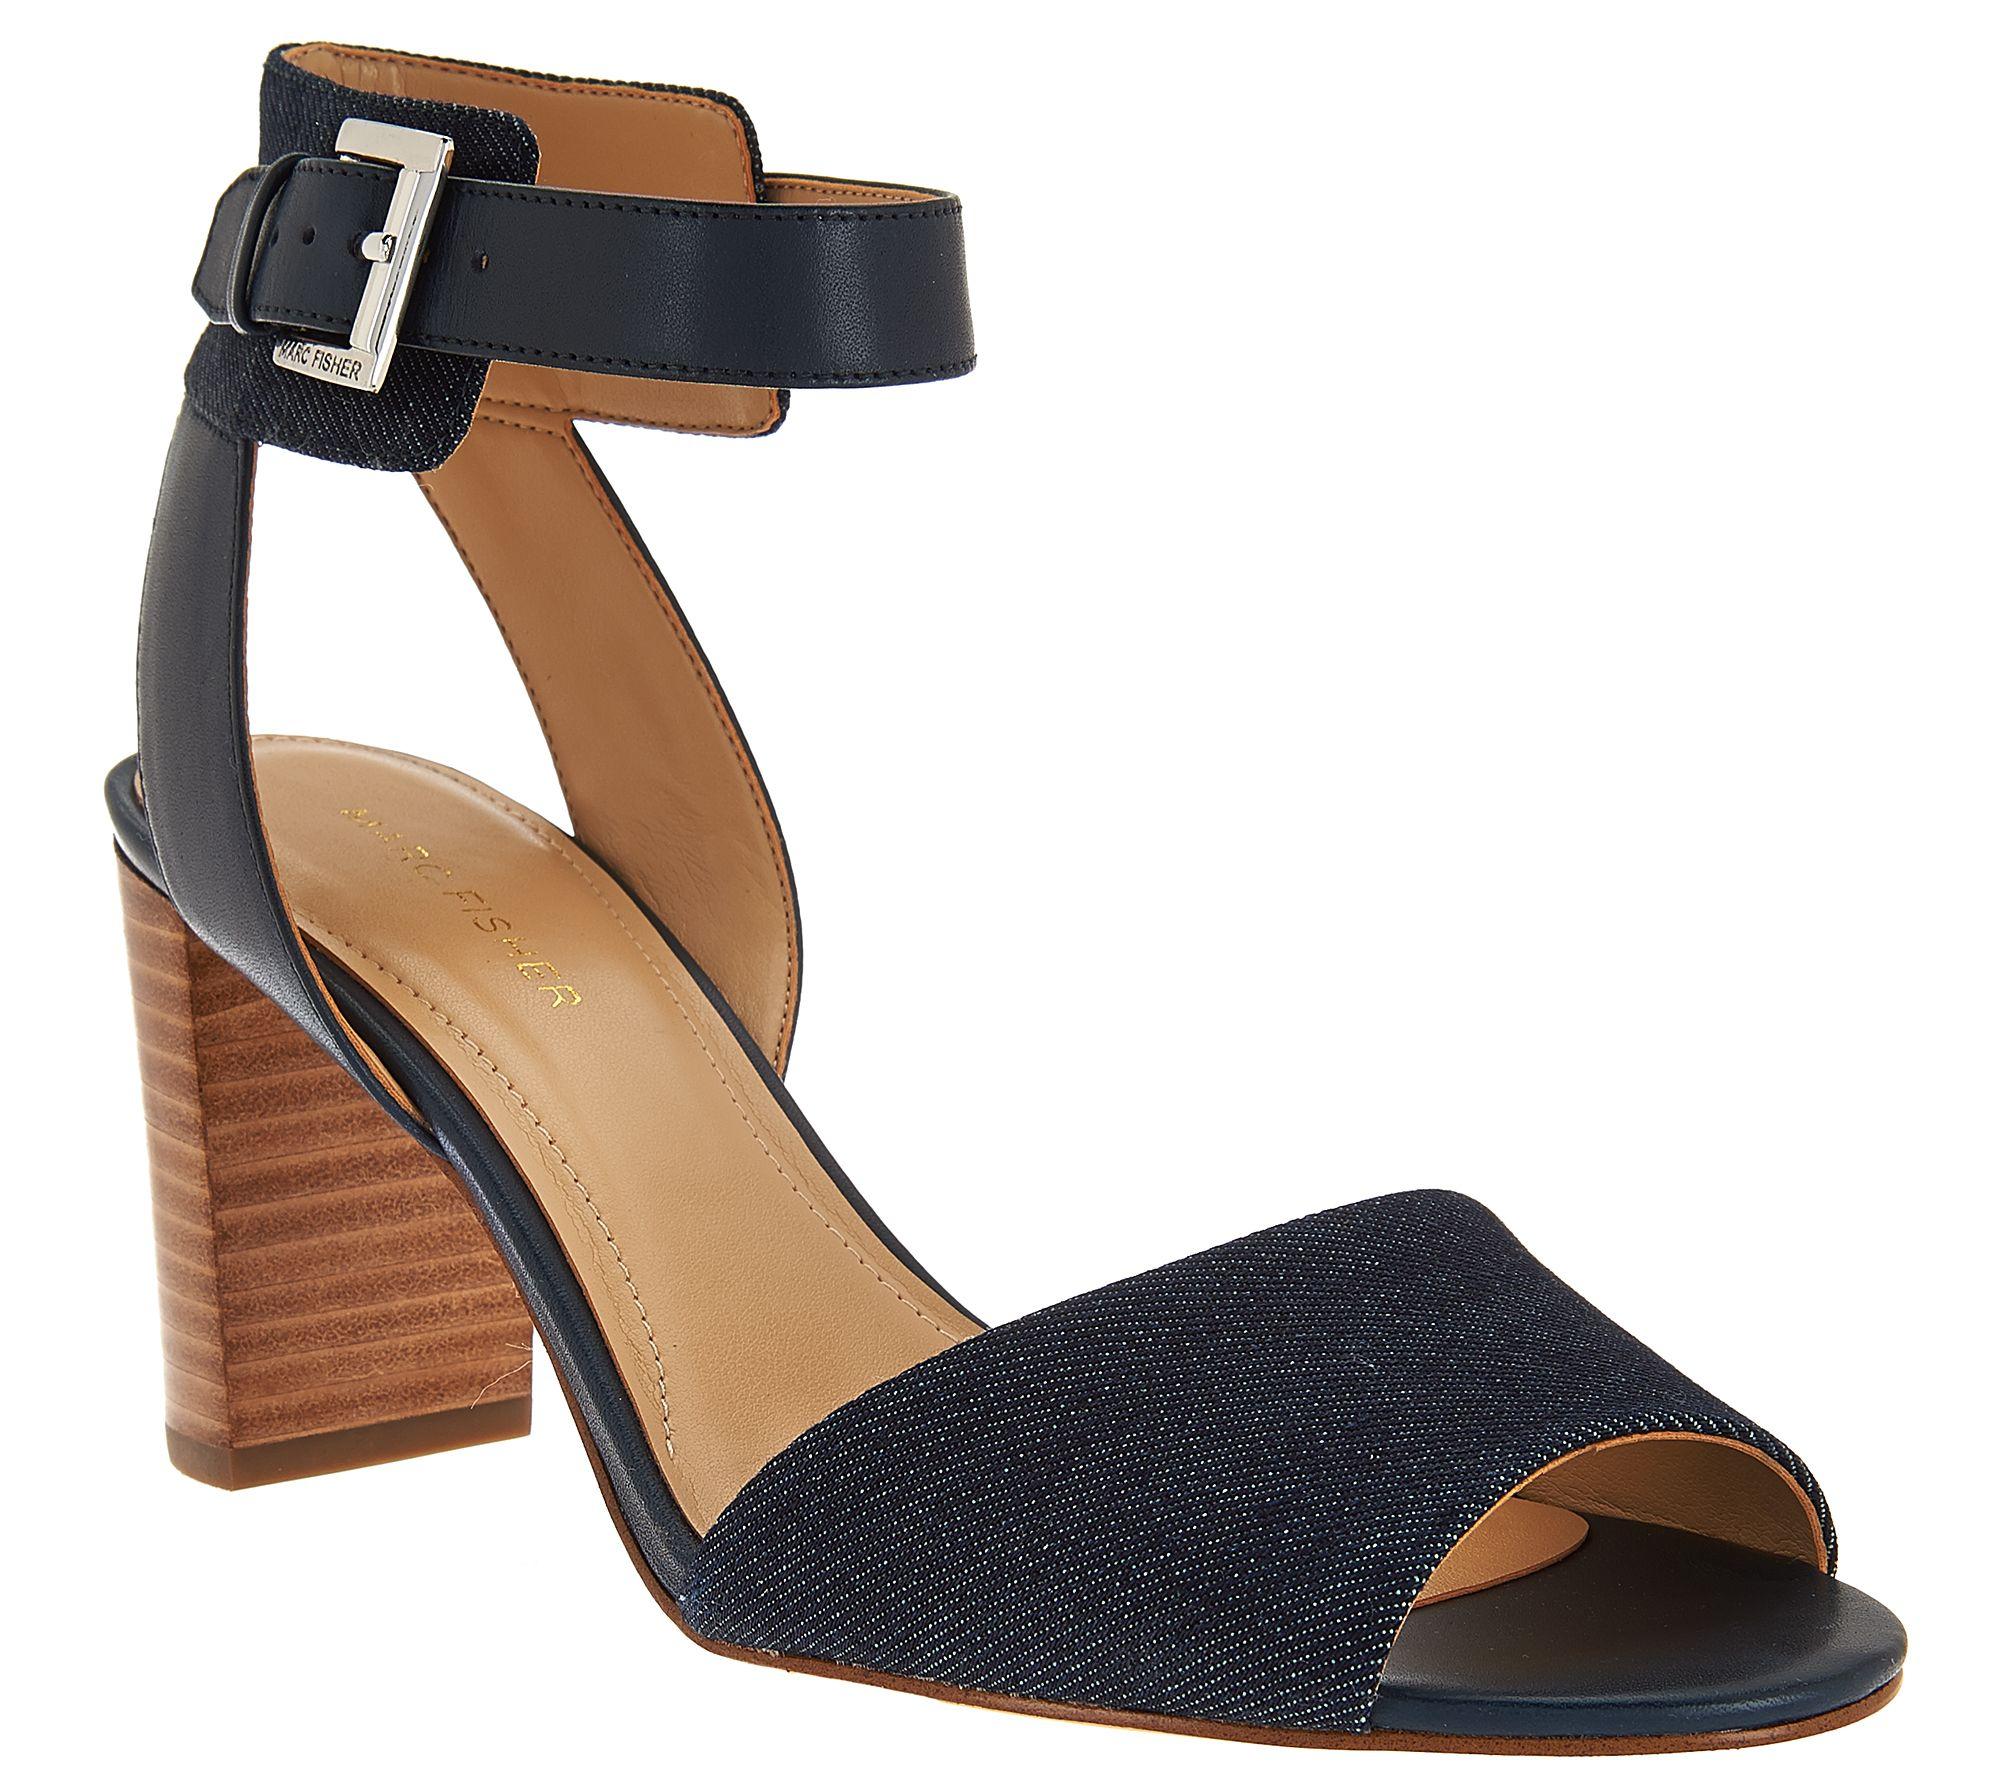 Marc Fisher Ankle Strap Block Heel Sandals - Genette — QVC.com